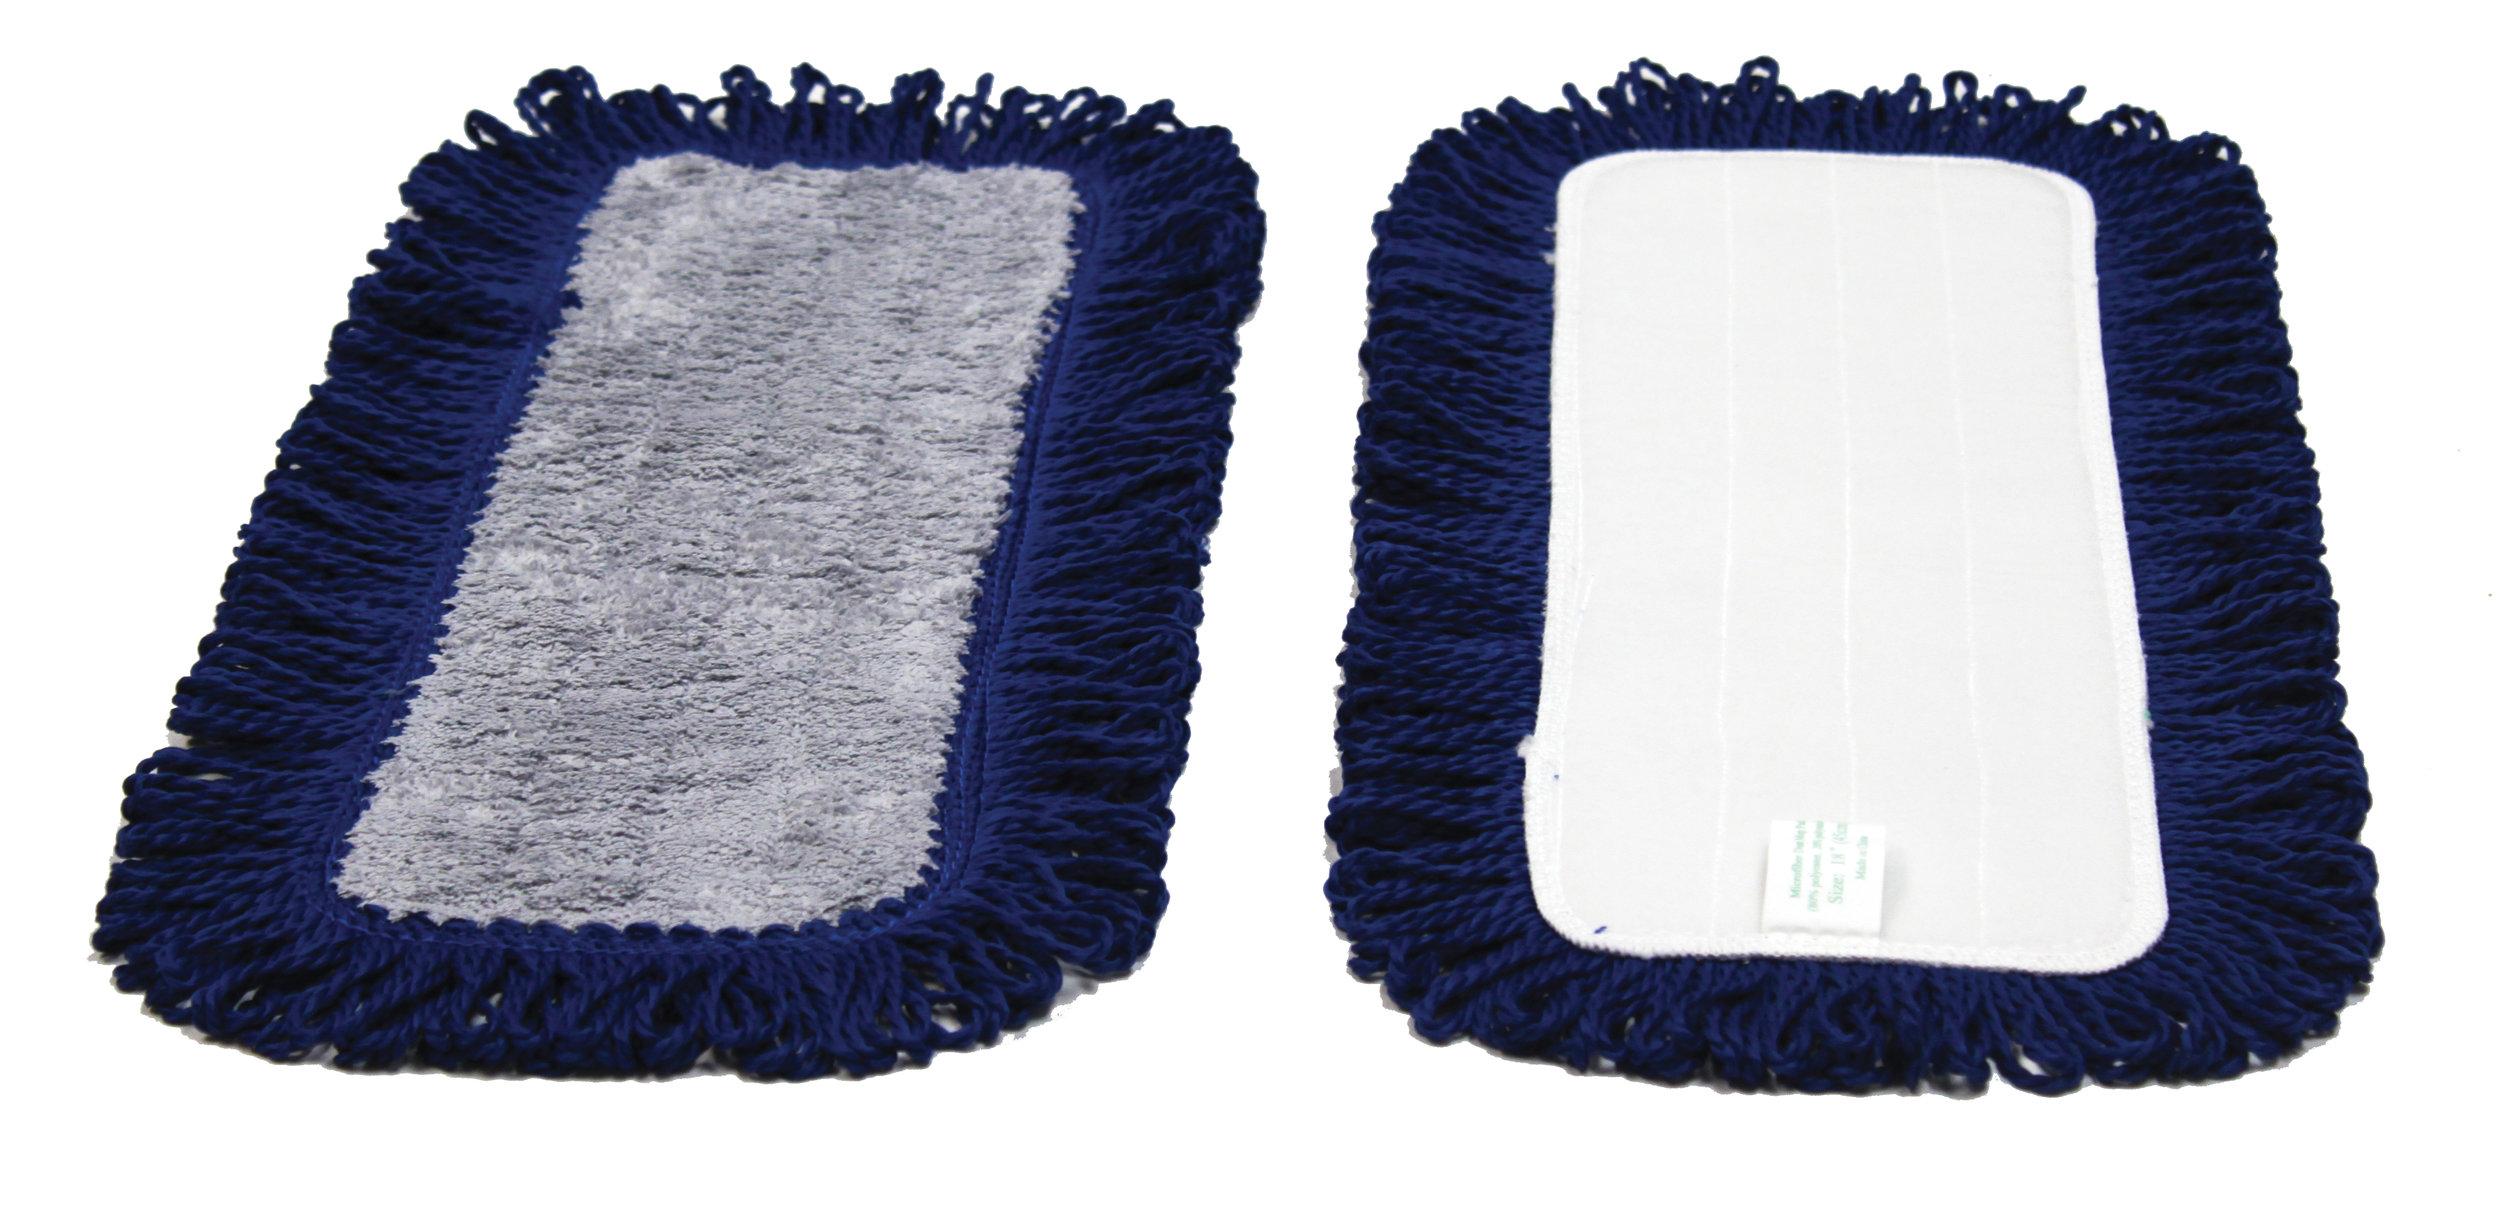 Microfiber Canvas-Backed Dust Mop